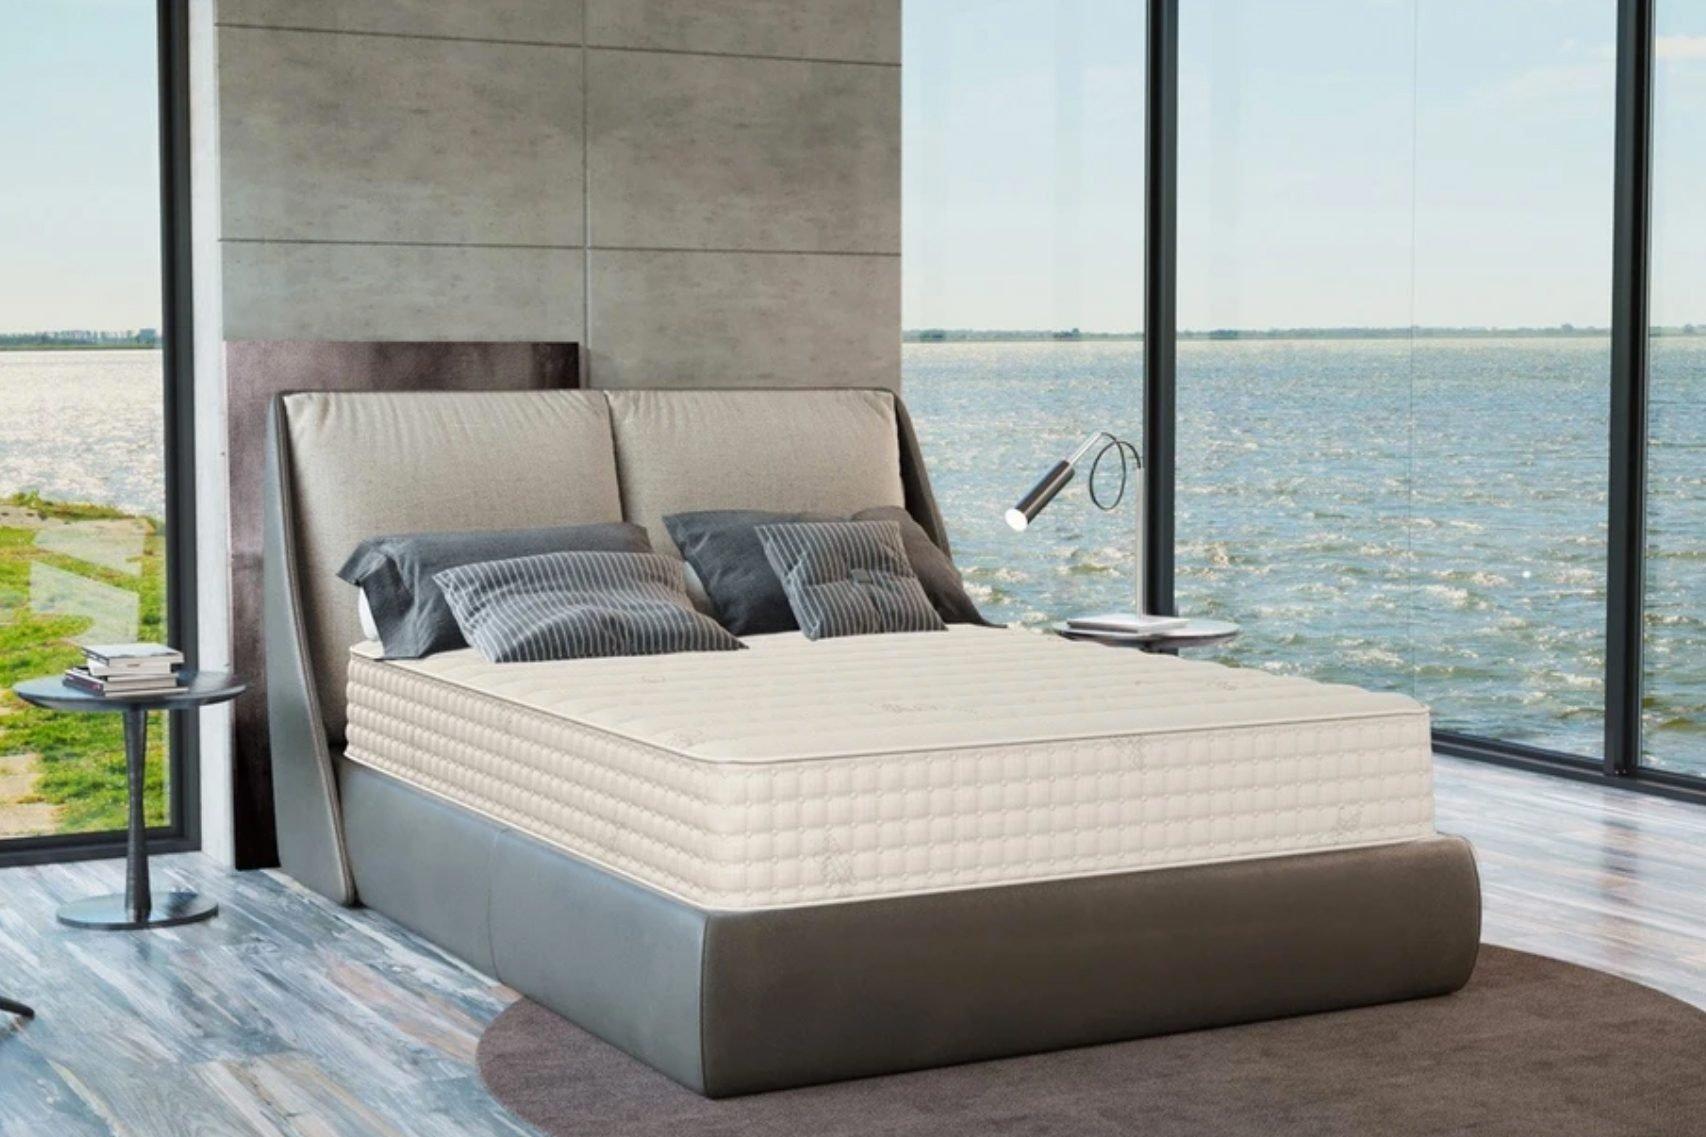 Plush Beds: $1,200 off all organic latex mattresses